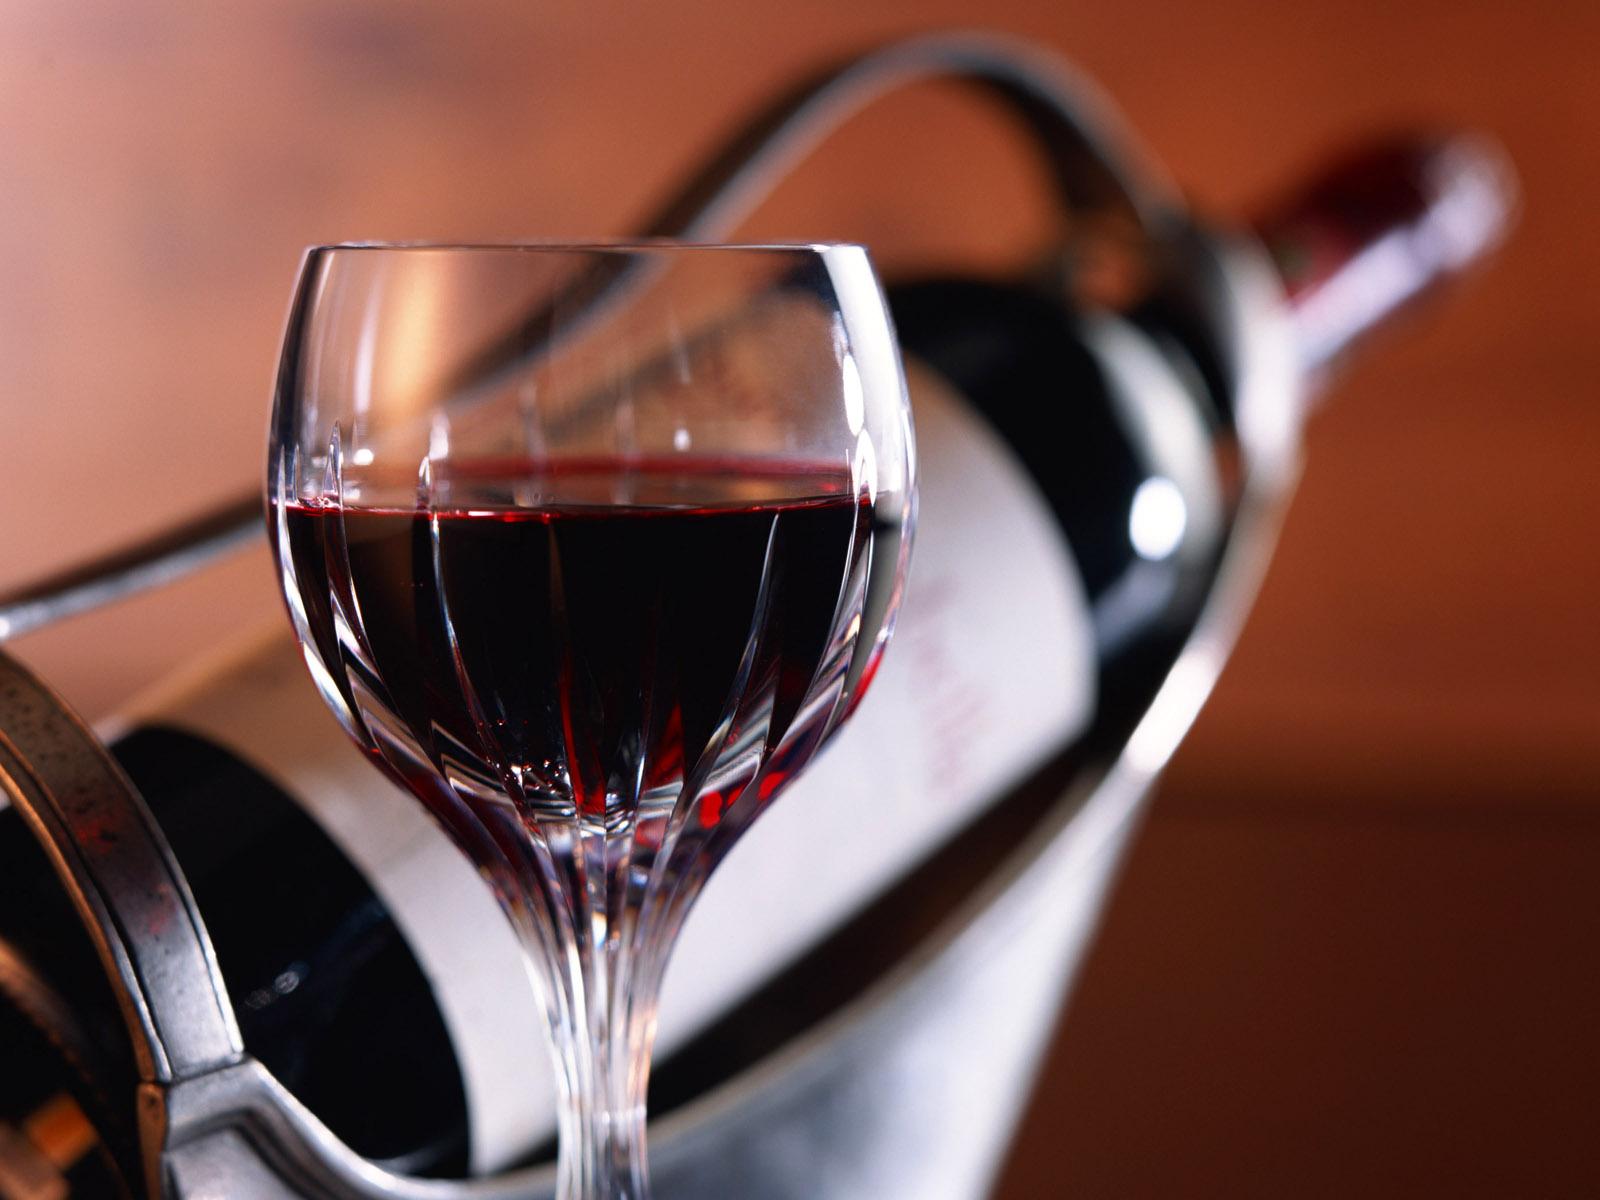 http://1.bp.blogspot.com/-RaT6Oo-r0Ro/Td2vICXZYDI/AAAAAAAAJo4/j-gmpa--8vo/s1600/wine_glass_schedule.jpg